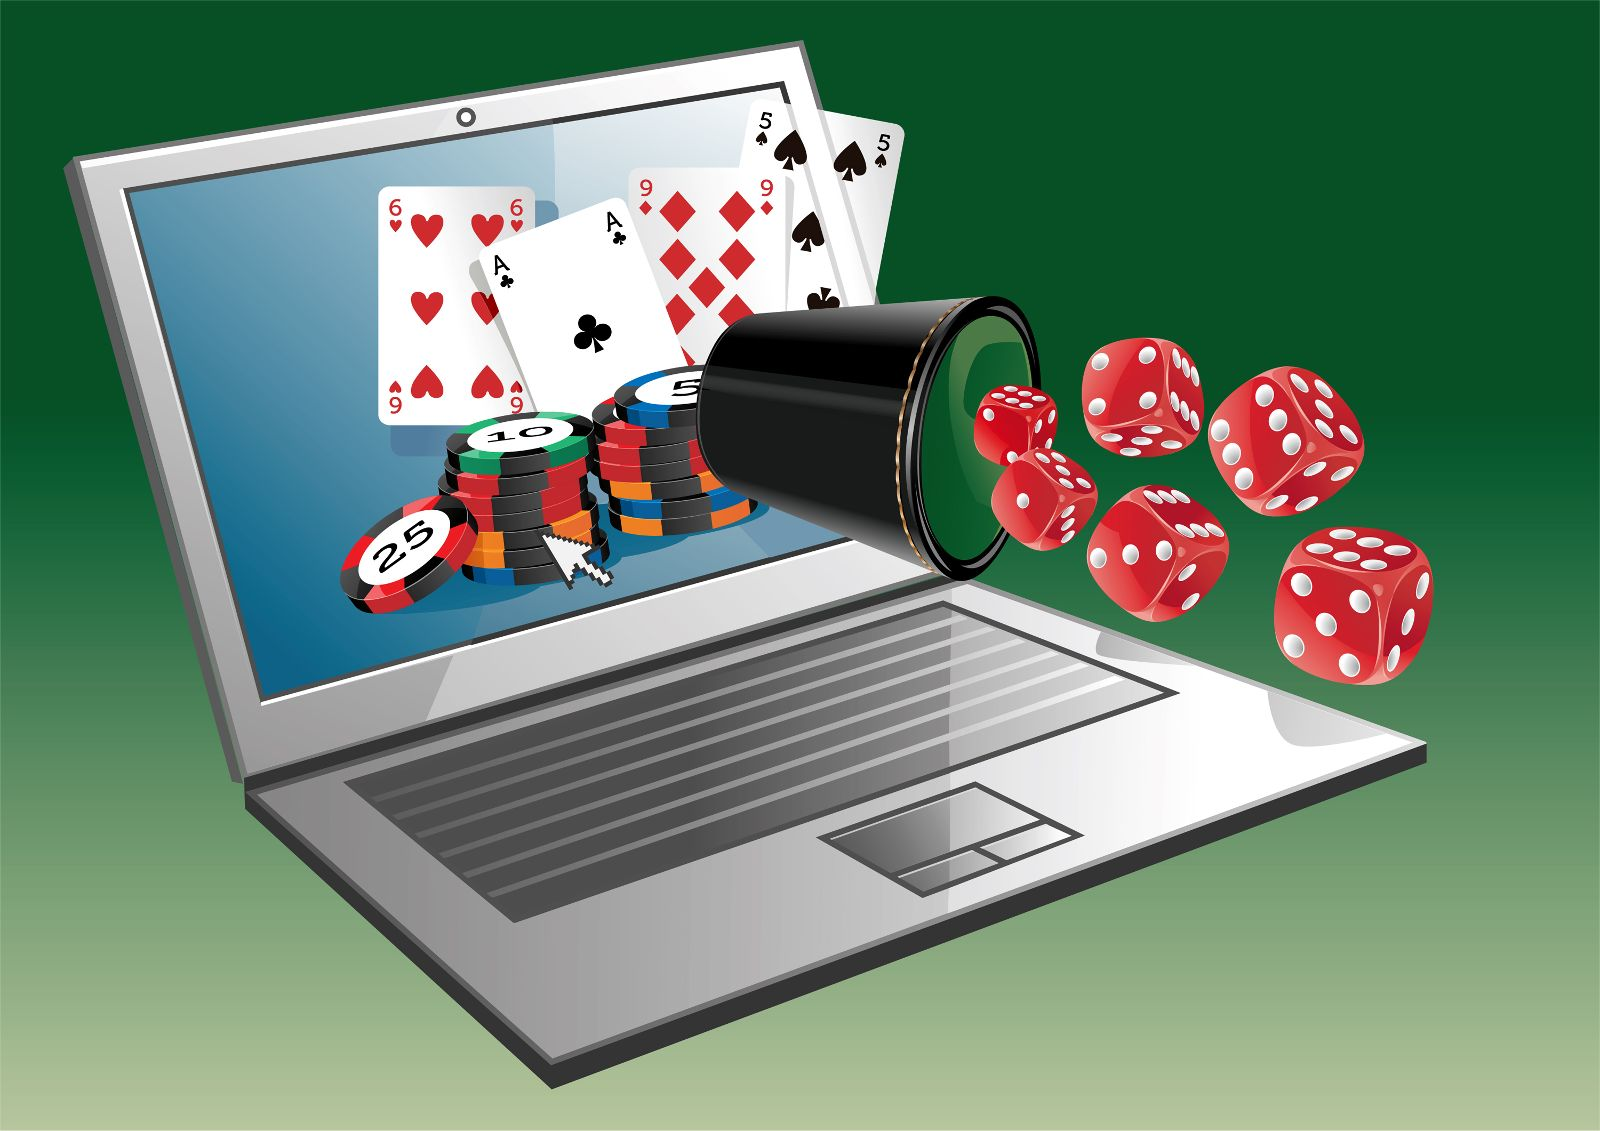 How-Technology-has-helped-change-the-way-Gamblers-Gamble.jpg (1600×1131)